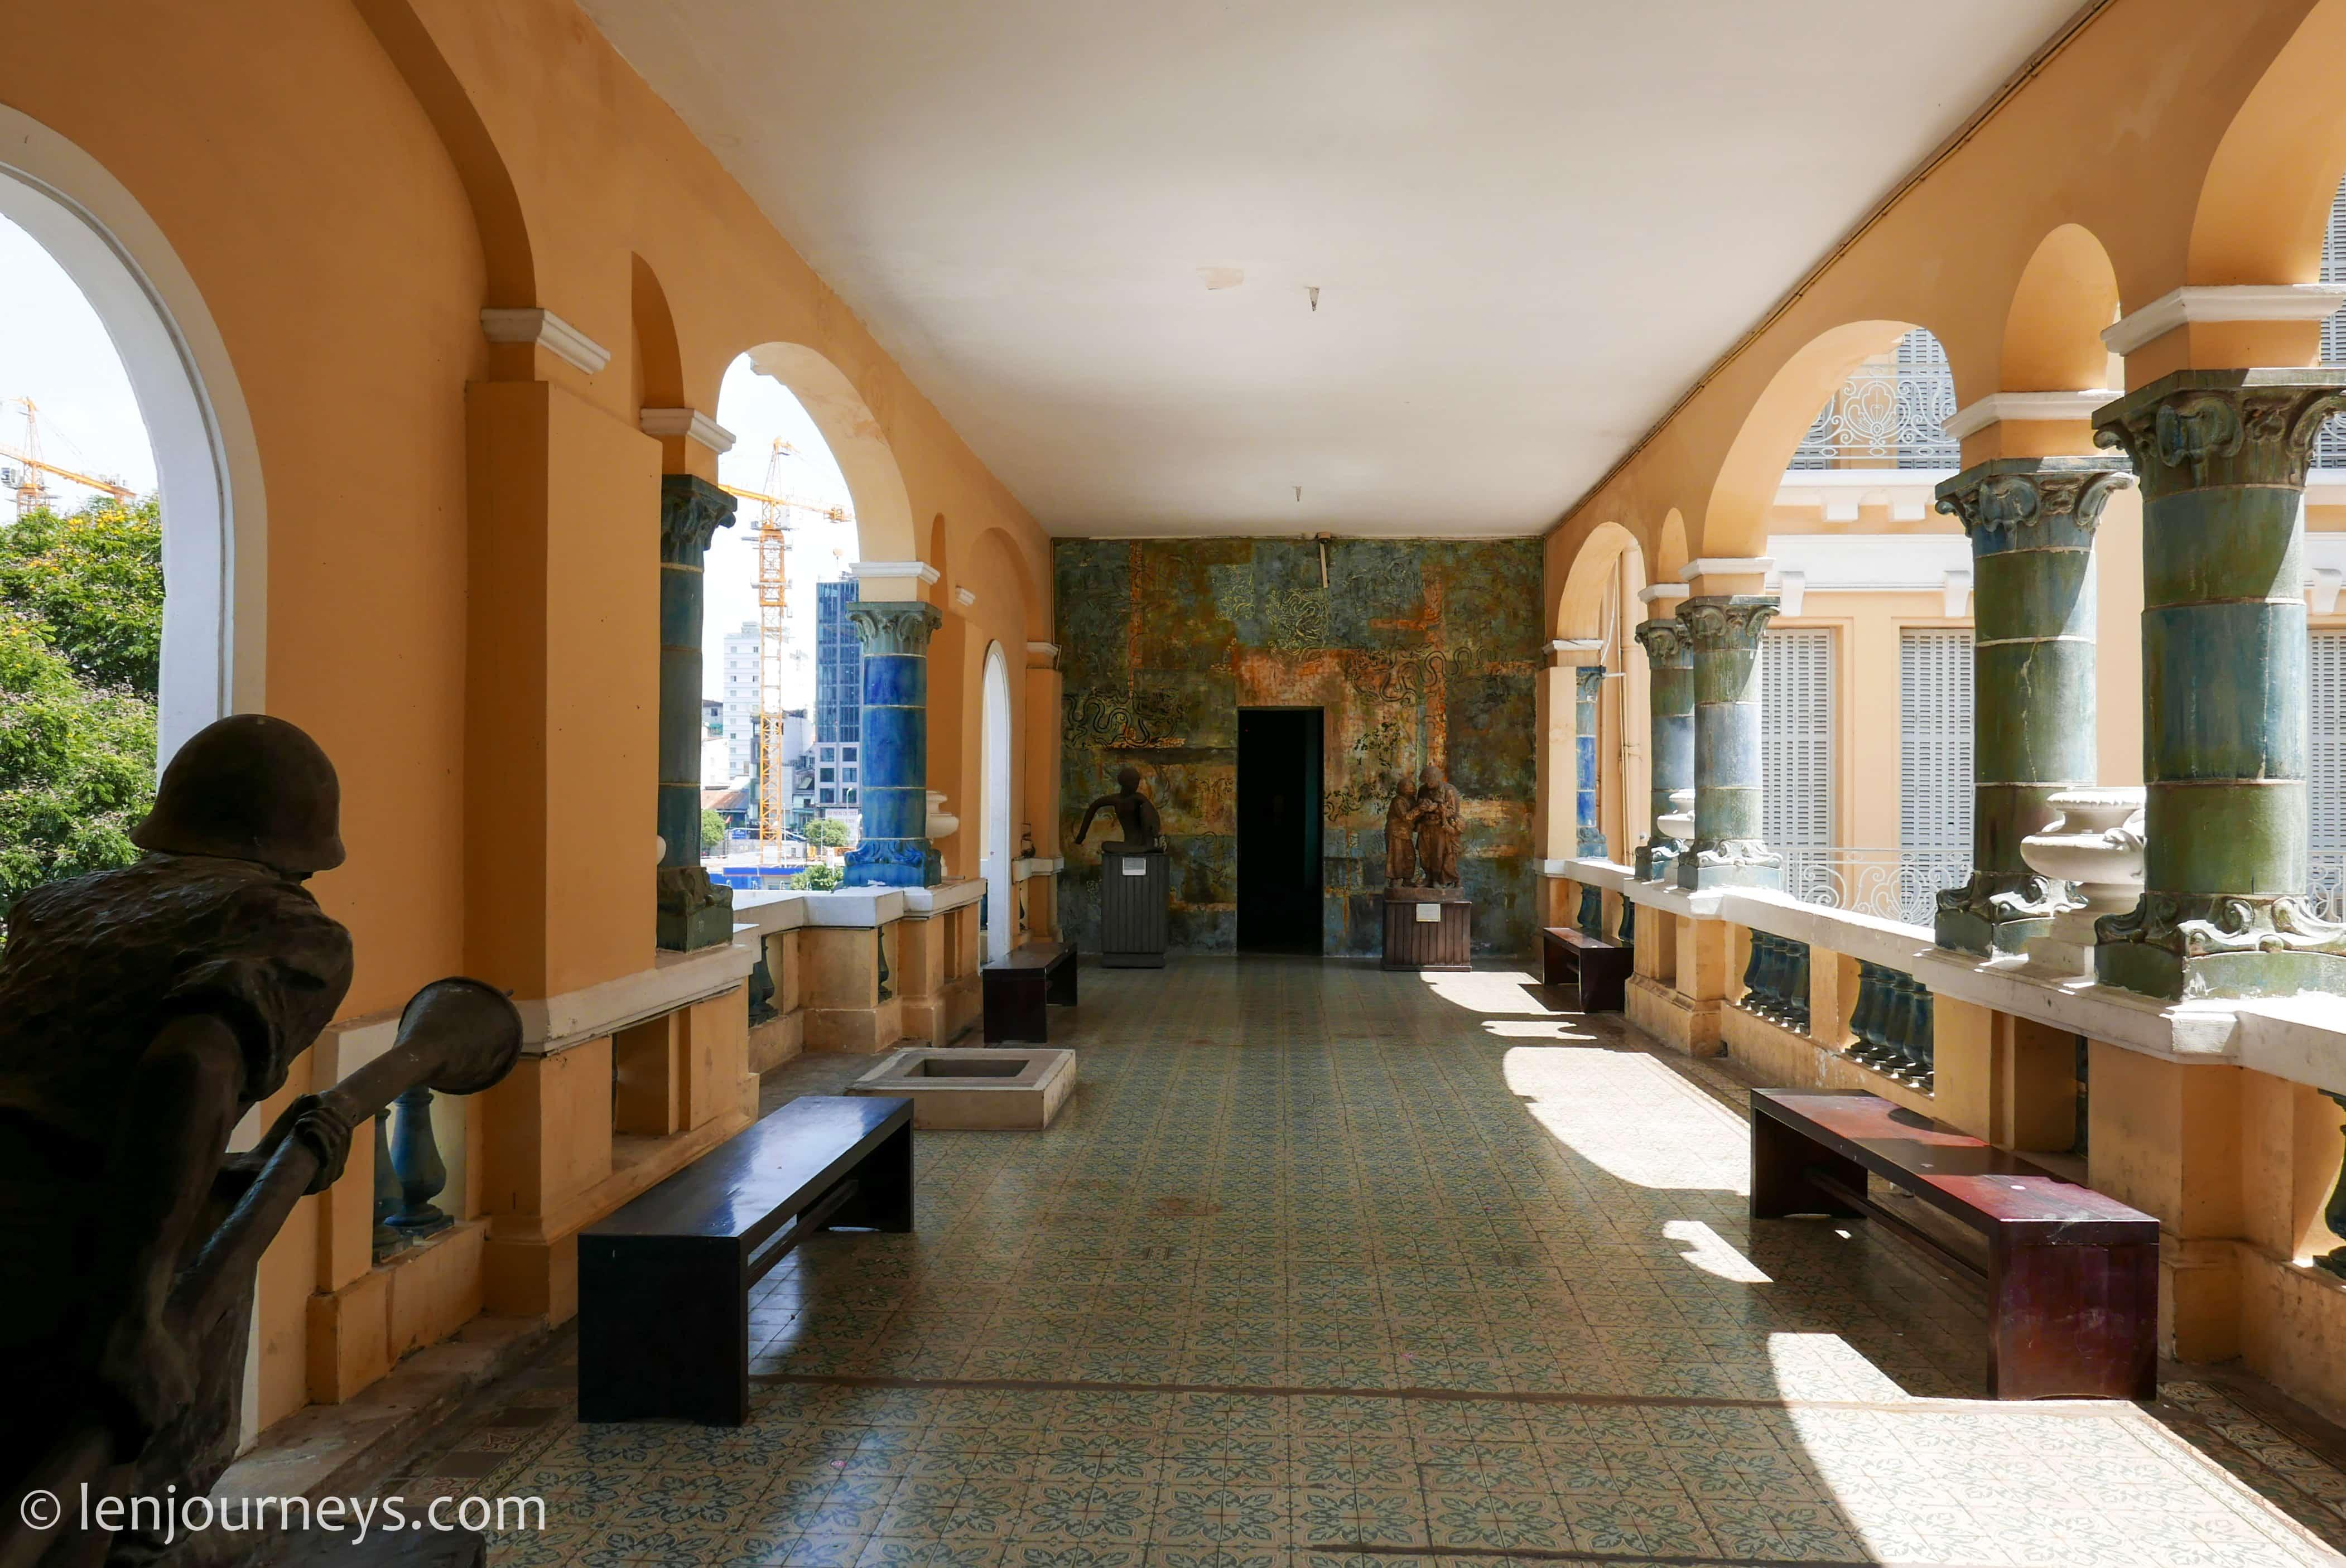 Corridor in the Museum of Fine Arts